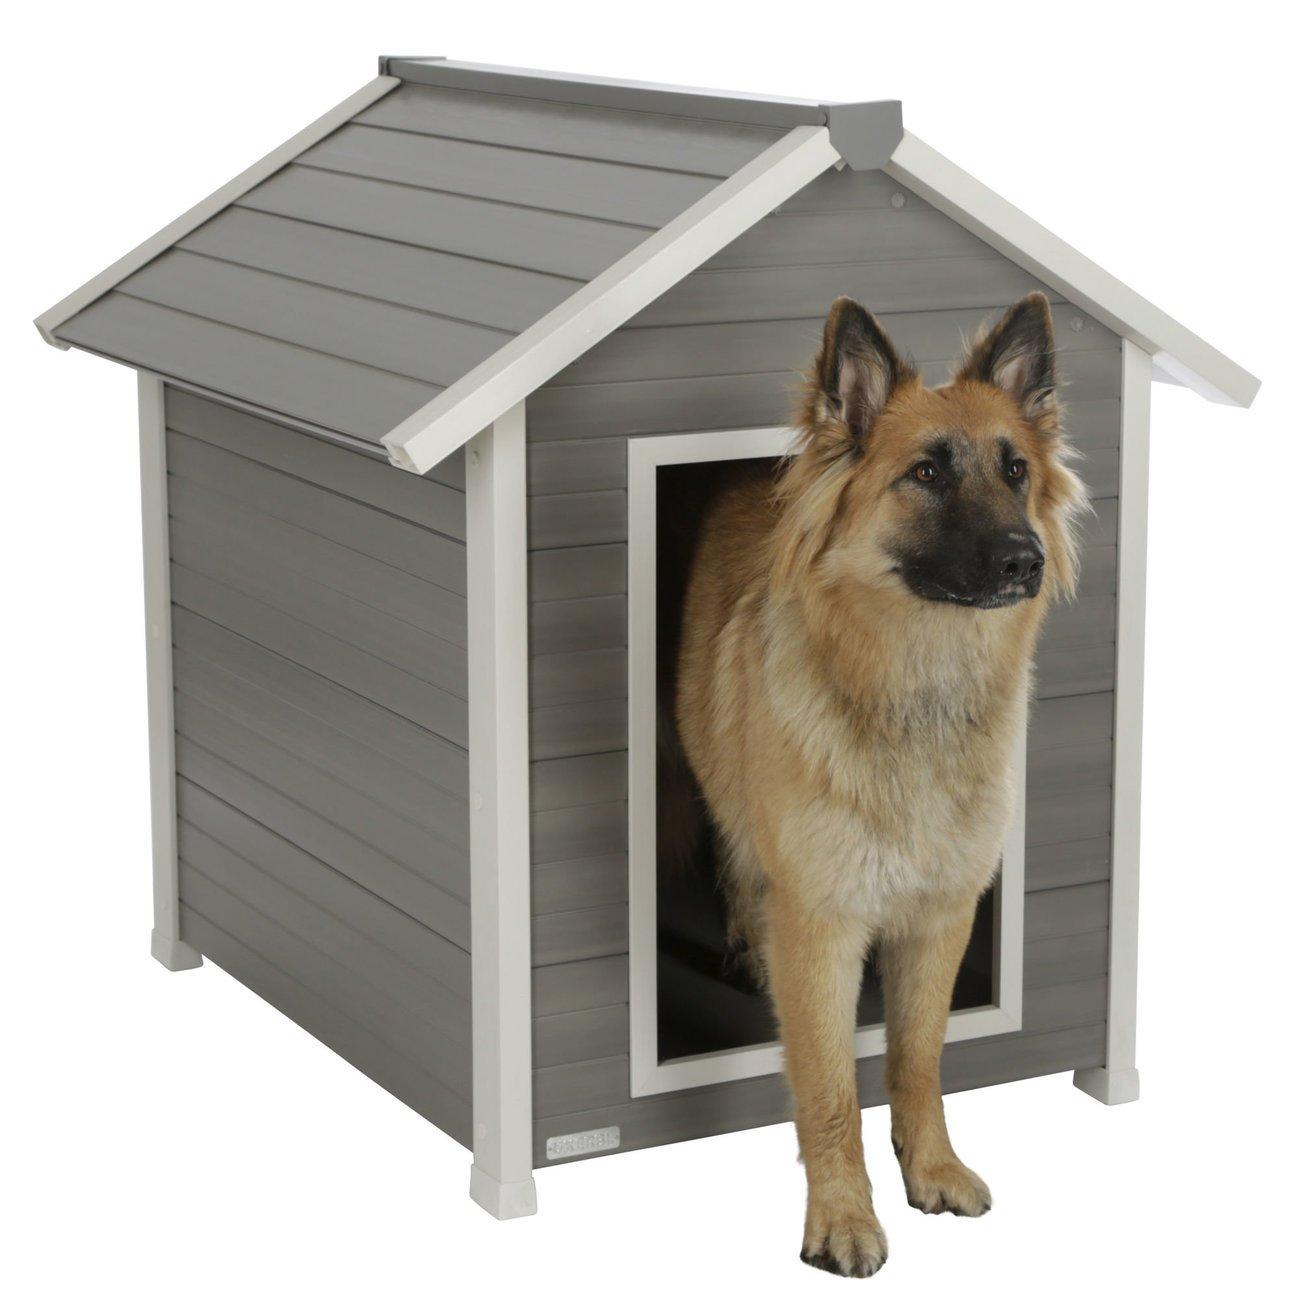 Kerbl Eco-Hundehütte Hendry, Bild 5